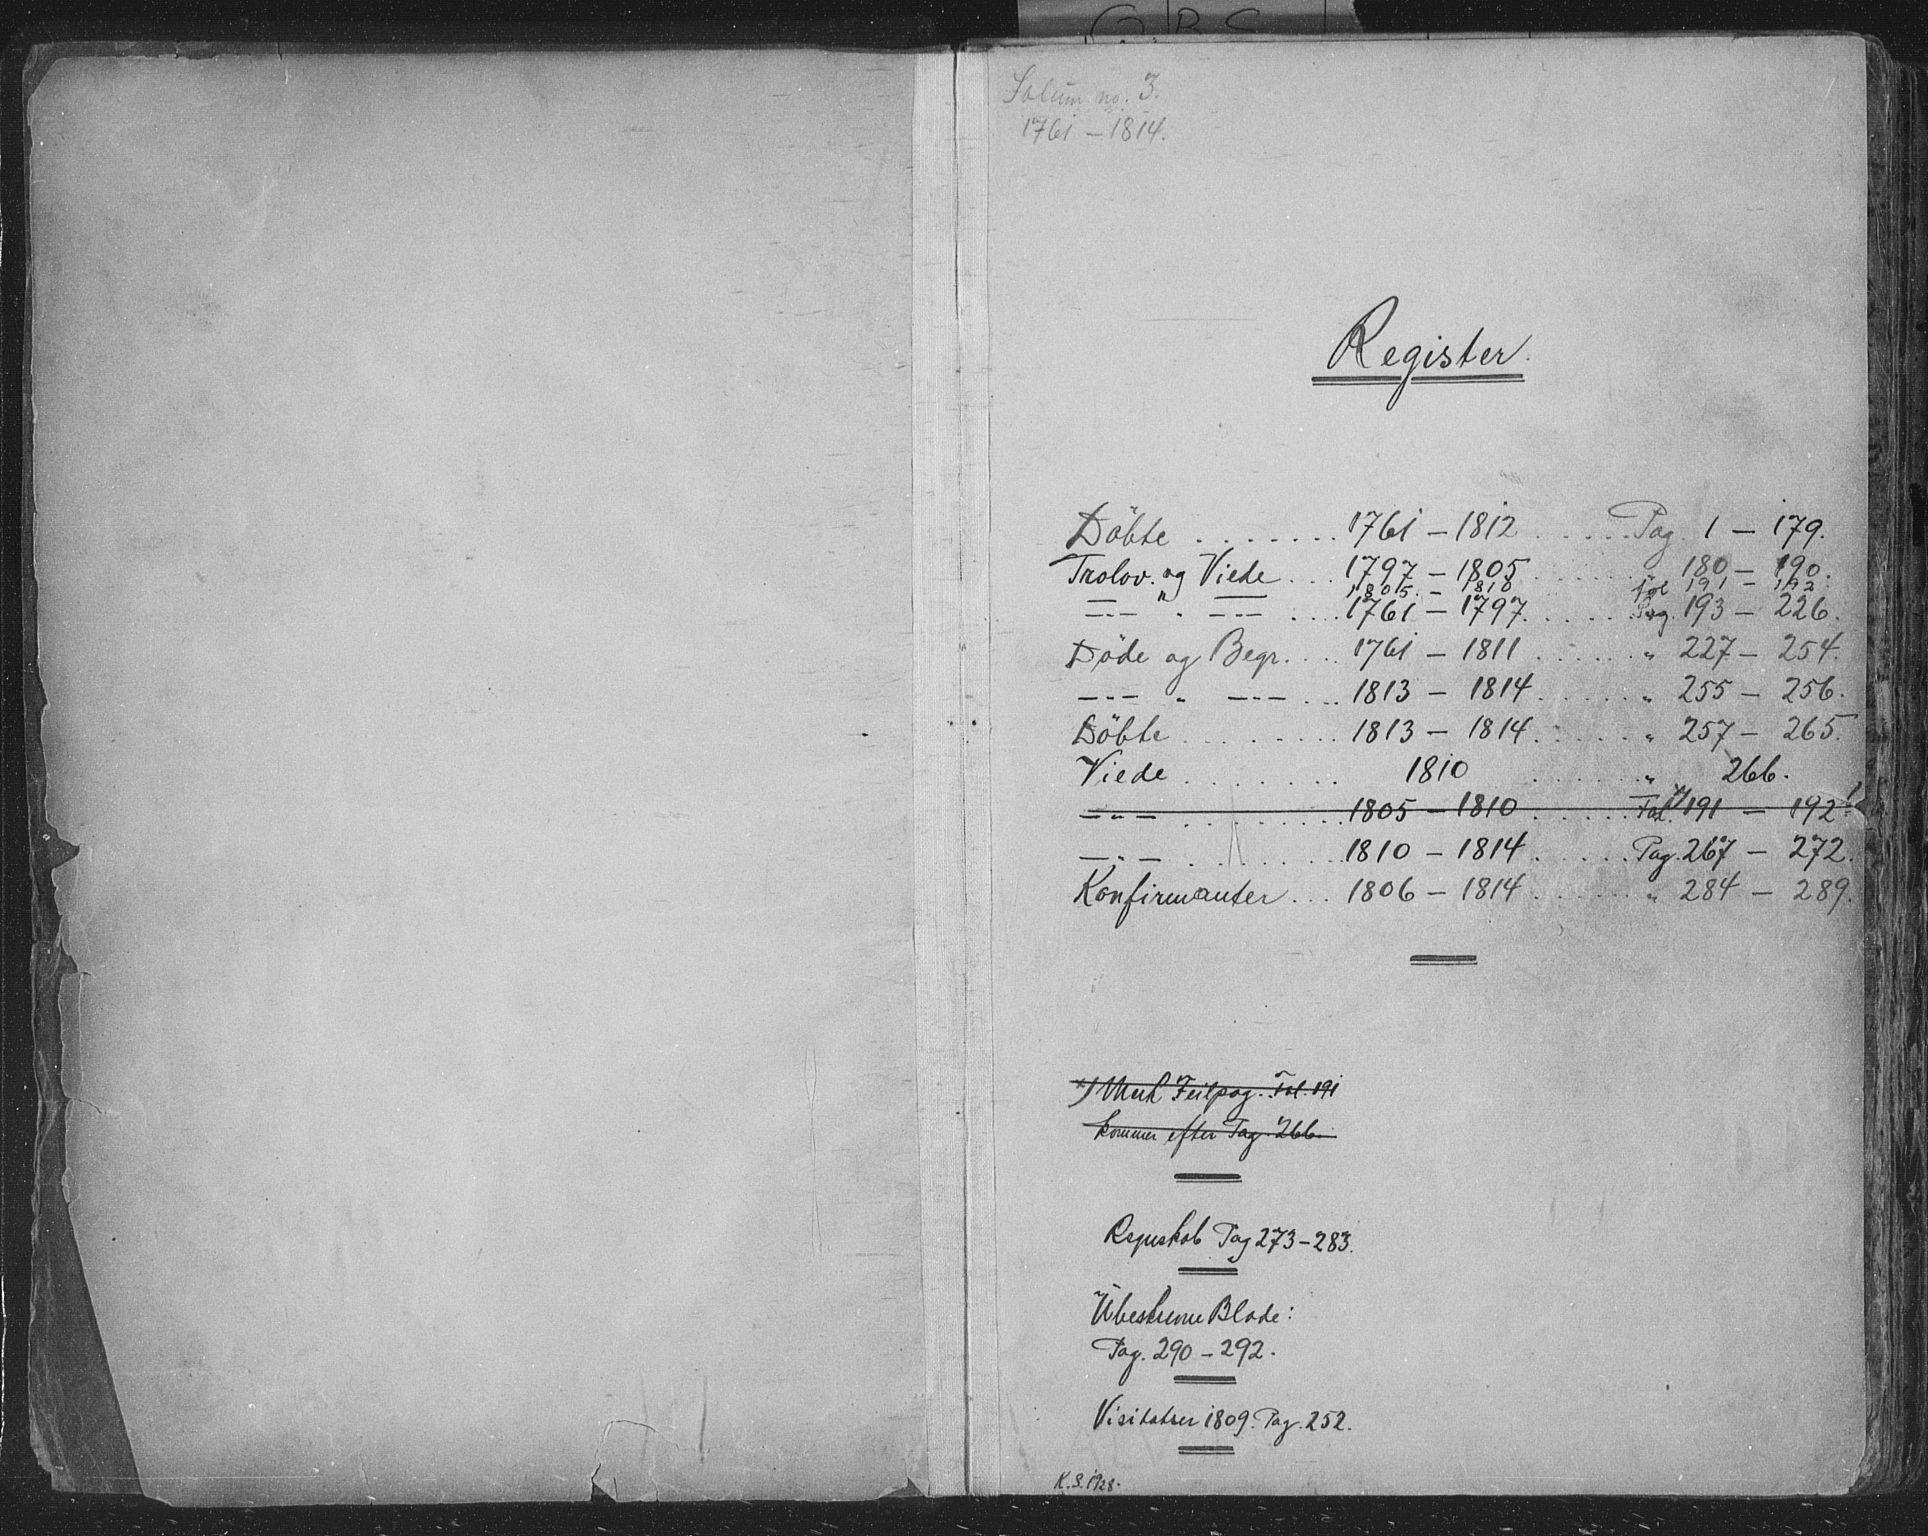 SAKO, Solum kirkebøker, F/Fa/L0003: Ministerialbok nr. I 3, 1761-1814